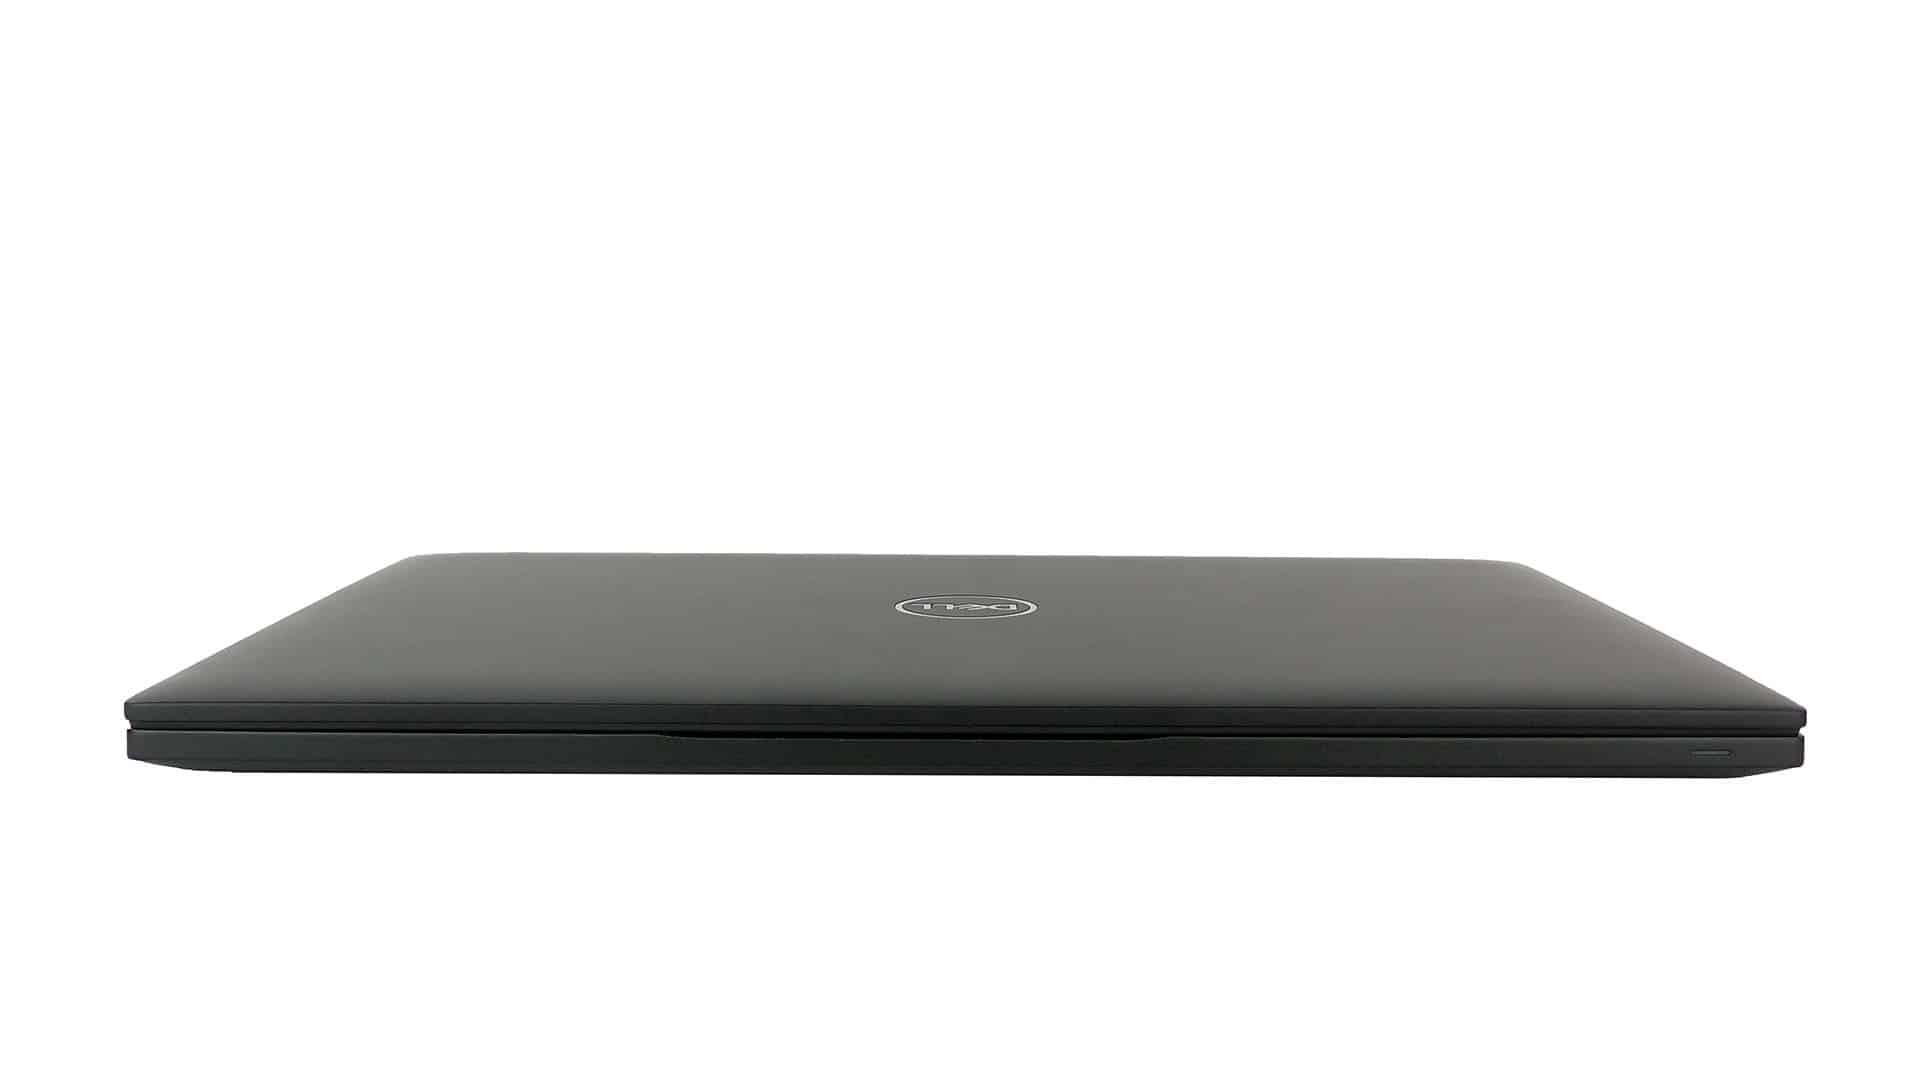 Dell Latitude 7490 - front notebooka